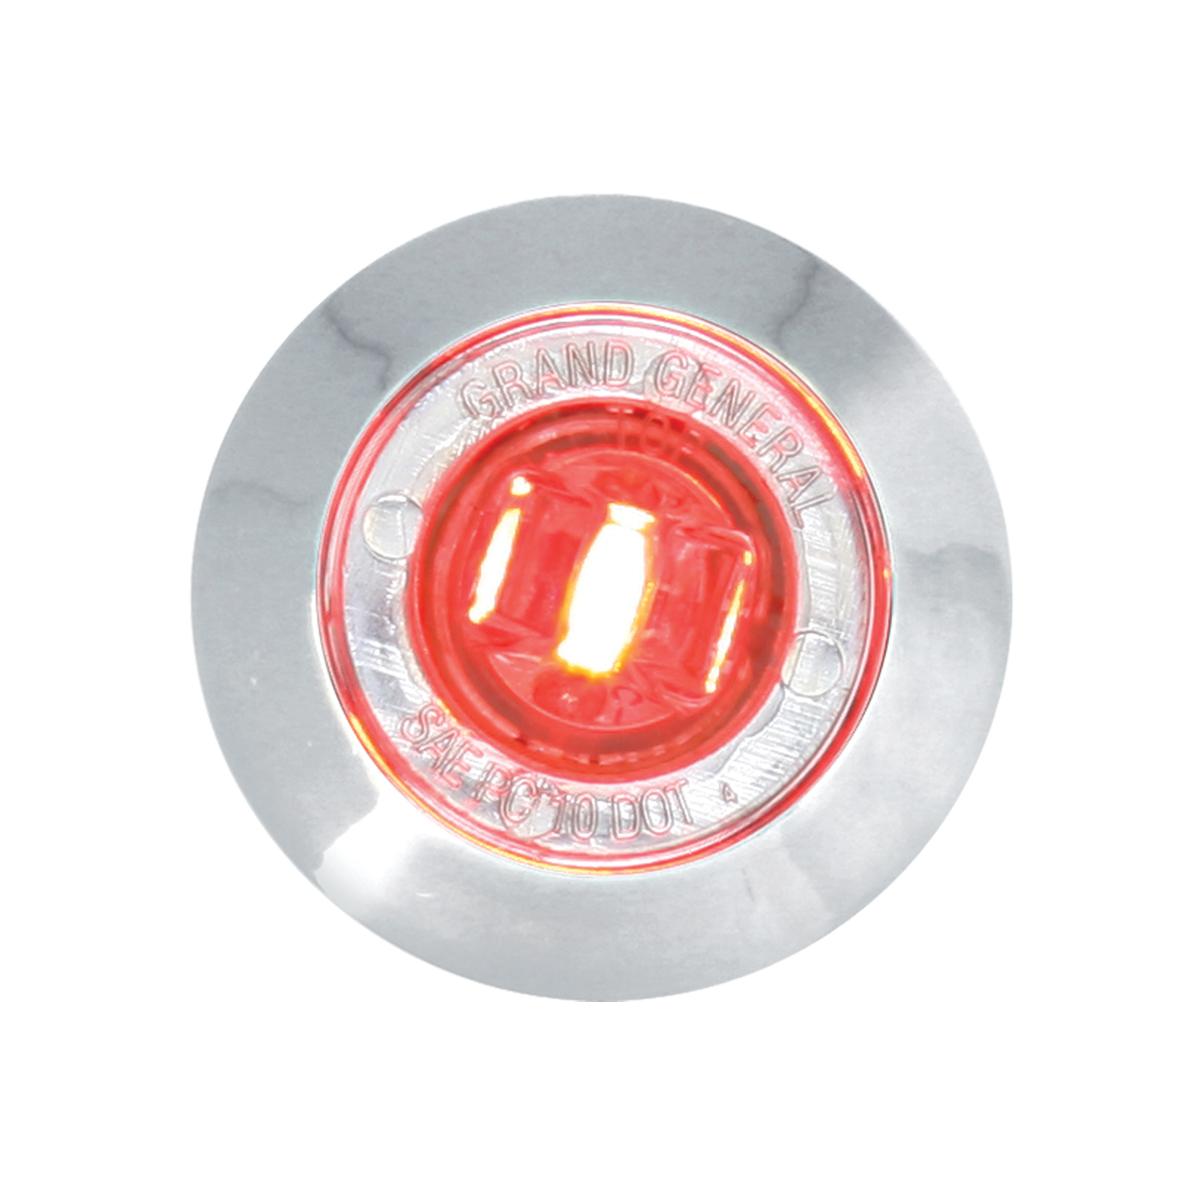 "75273 1"" Dual Function Mini Push/Screw-in Wide Angle LED Light w/ Chrome Bezel"